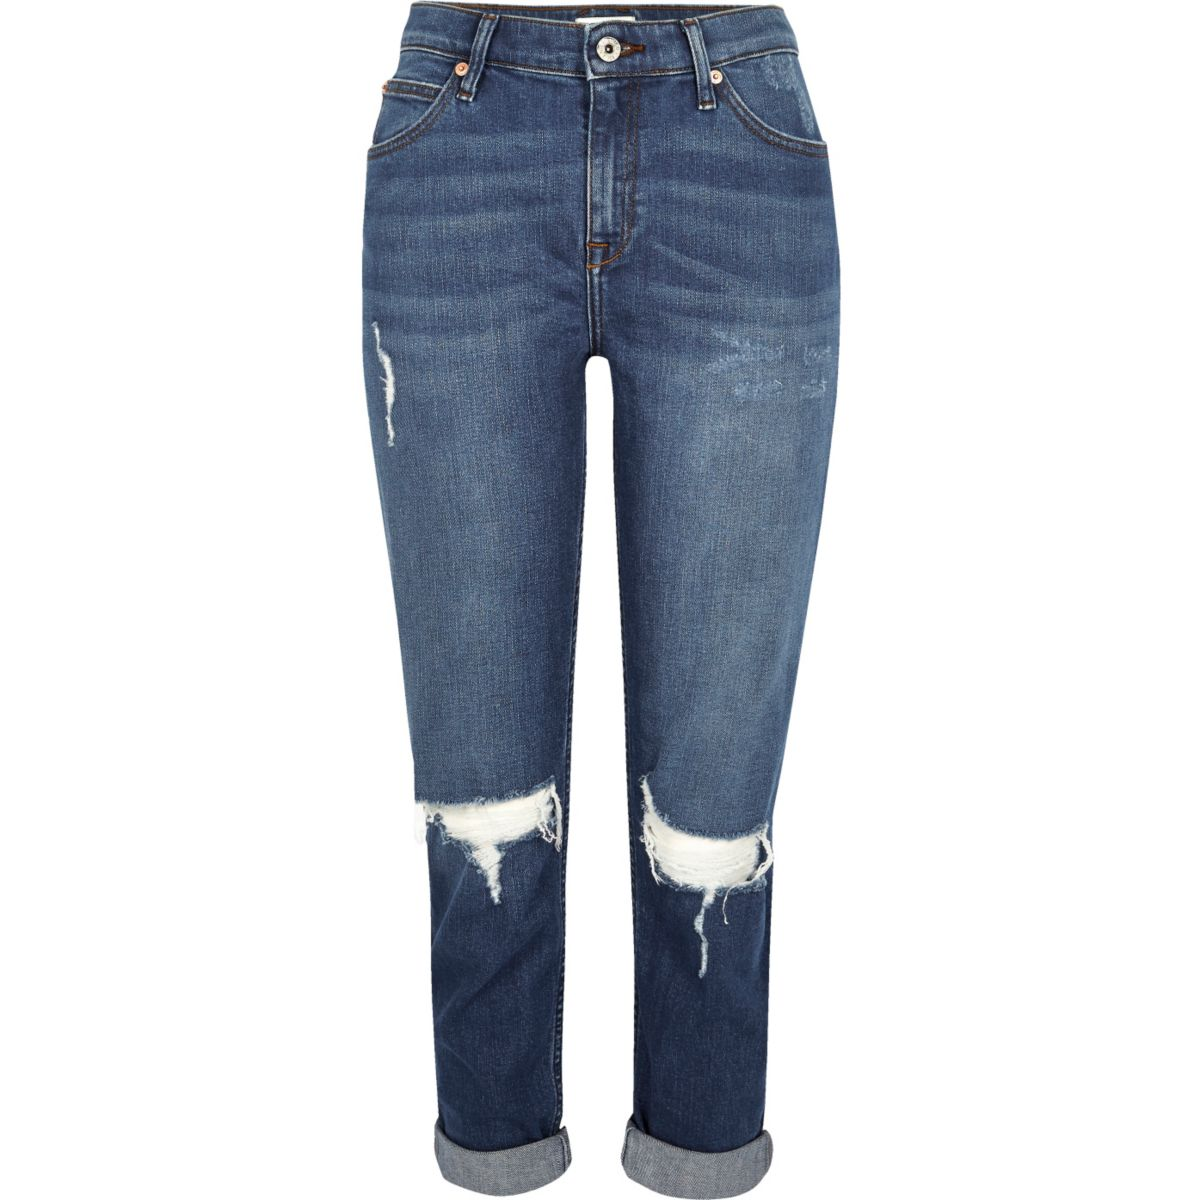 Ashley - Donkerblauwe wash ripped boyfriend jeans